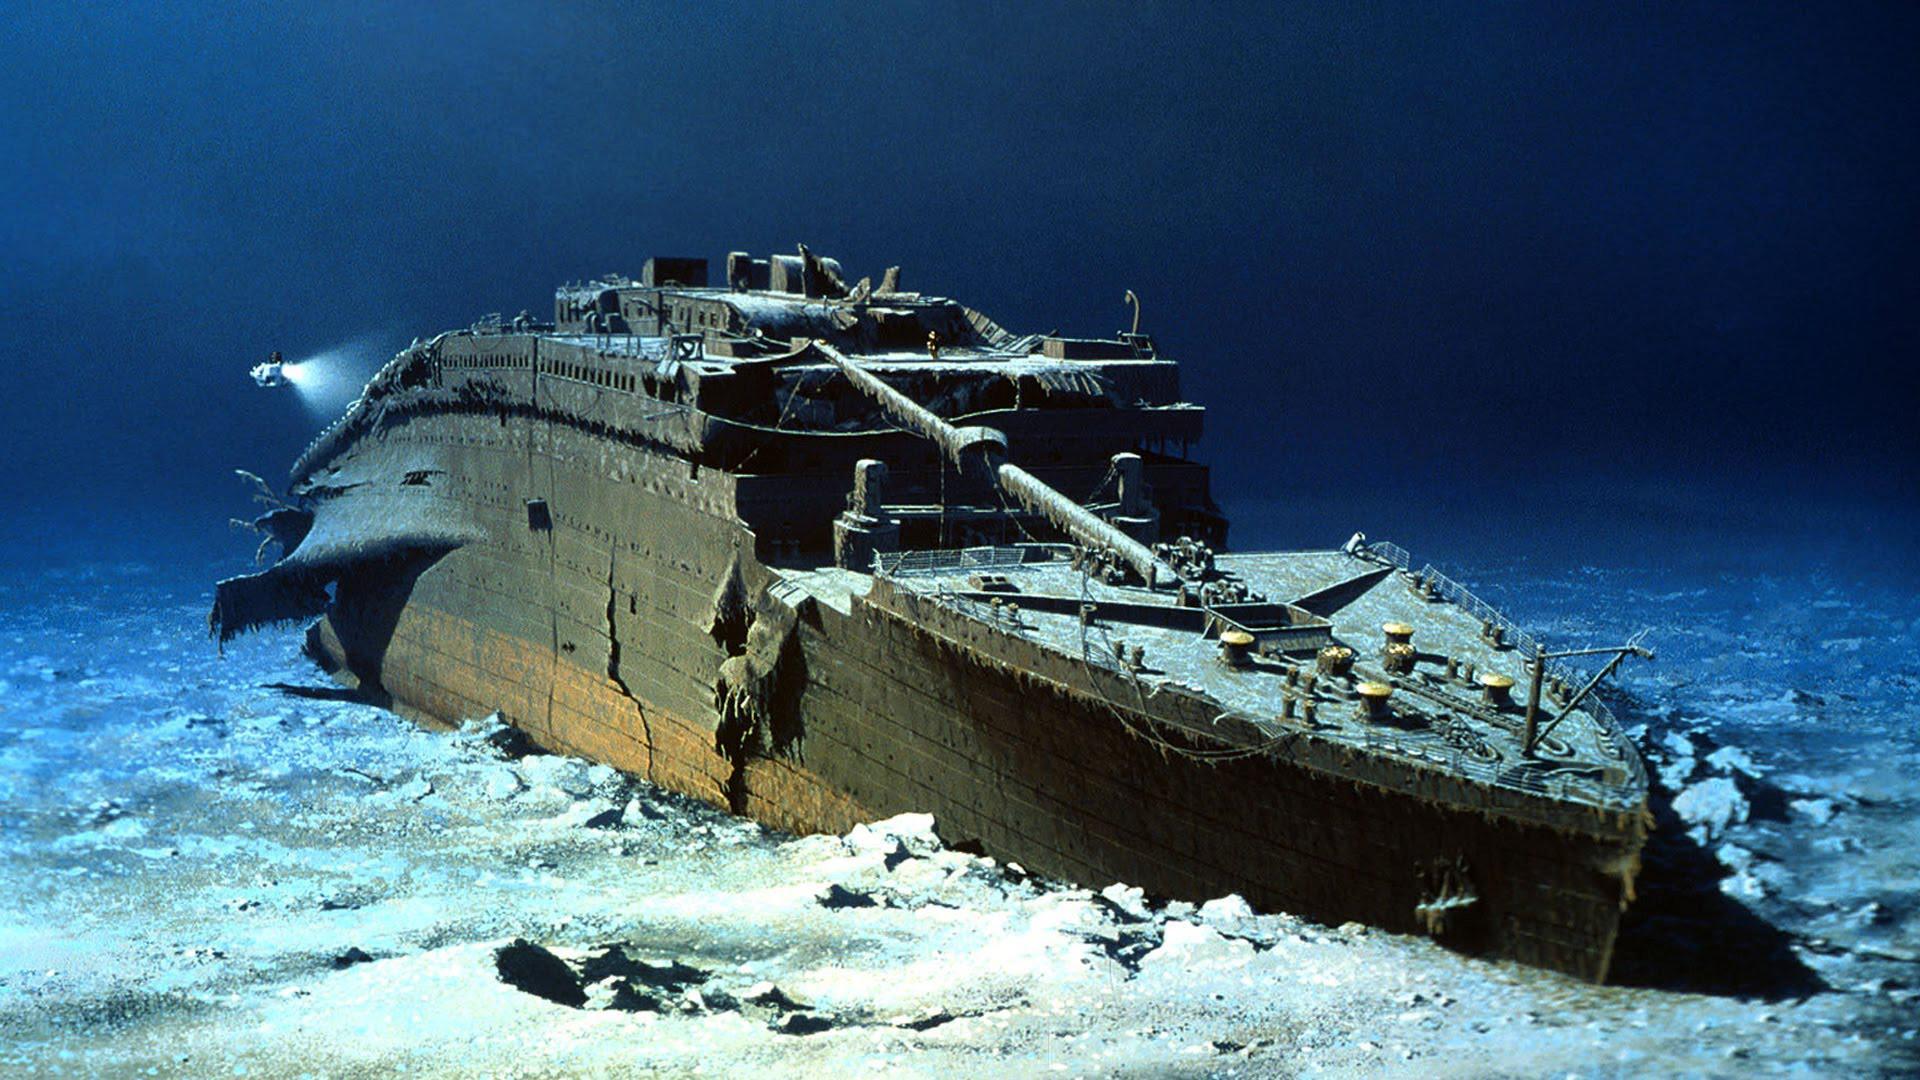 Titanic Sinking Wallpapers ①